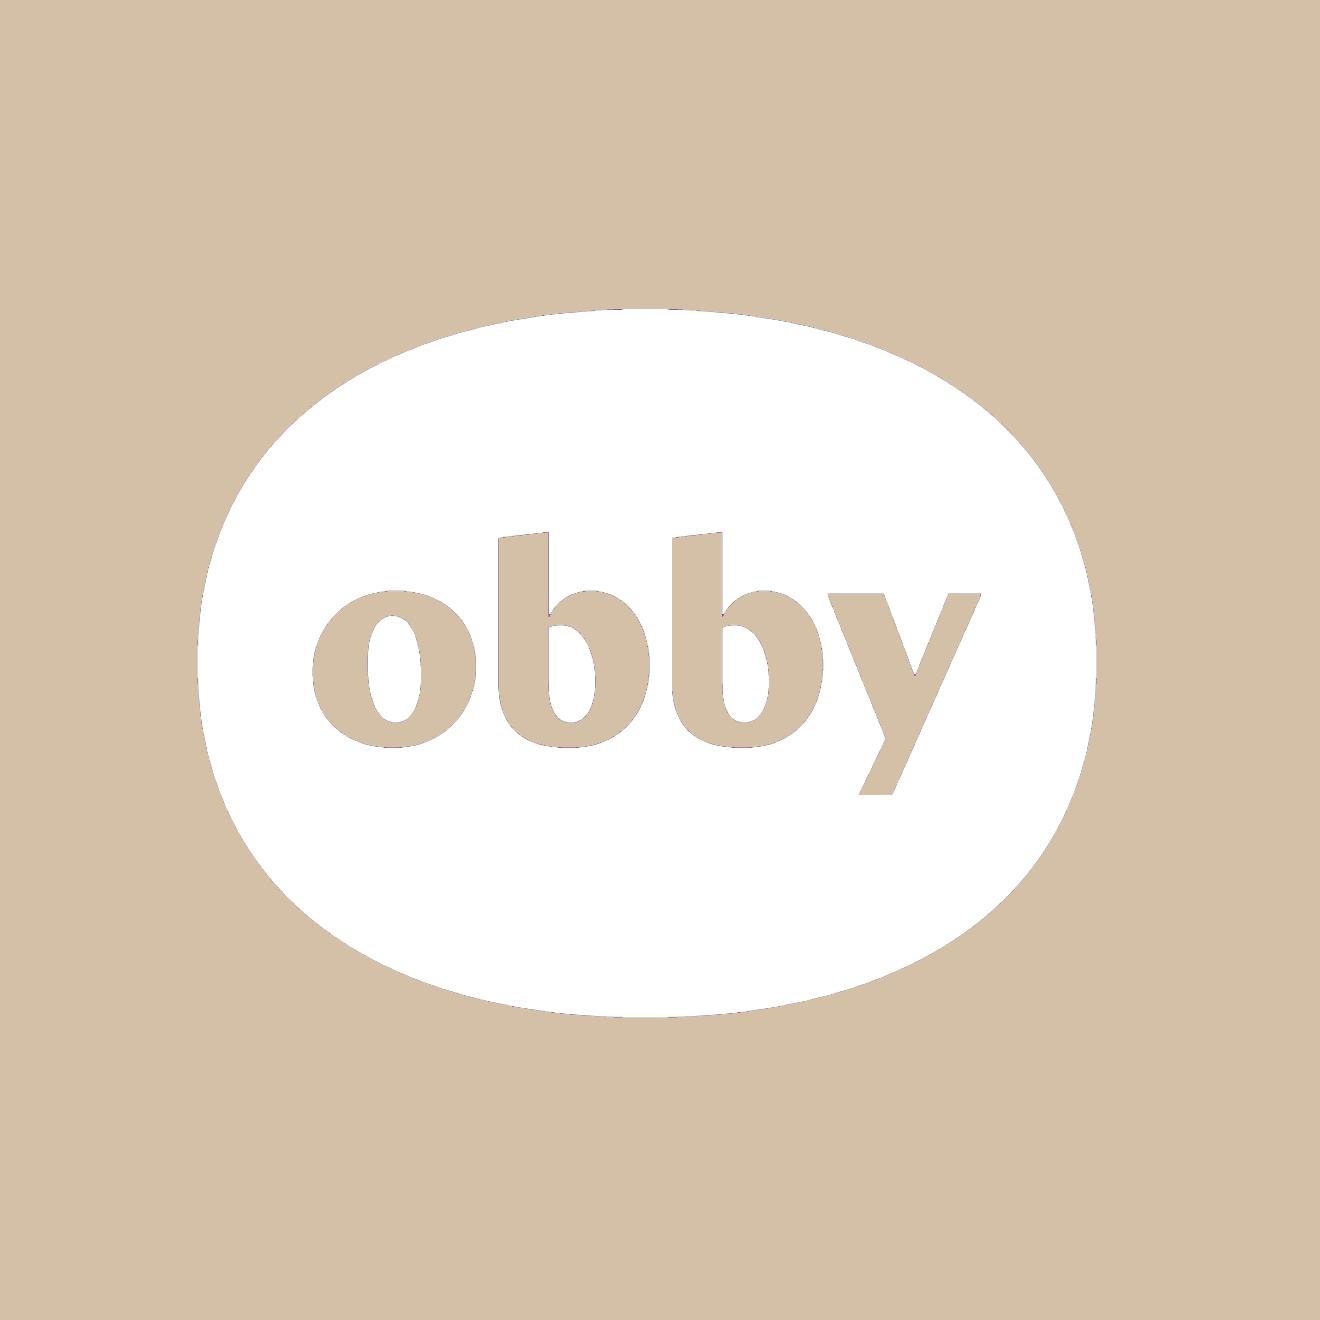 Obby Logo - square beige